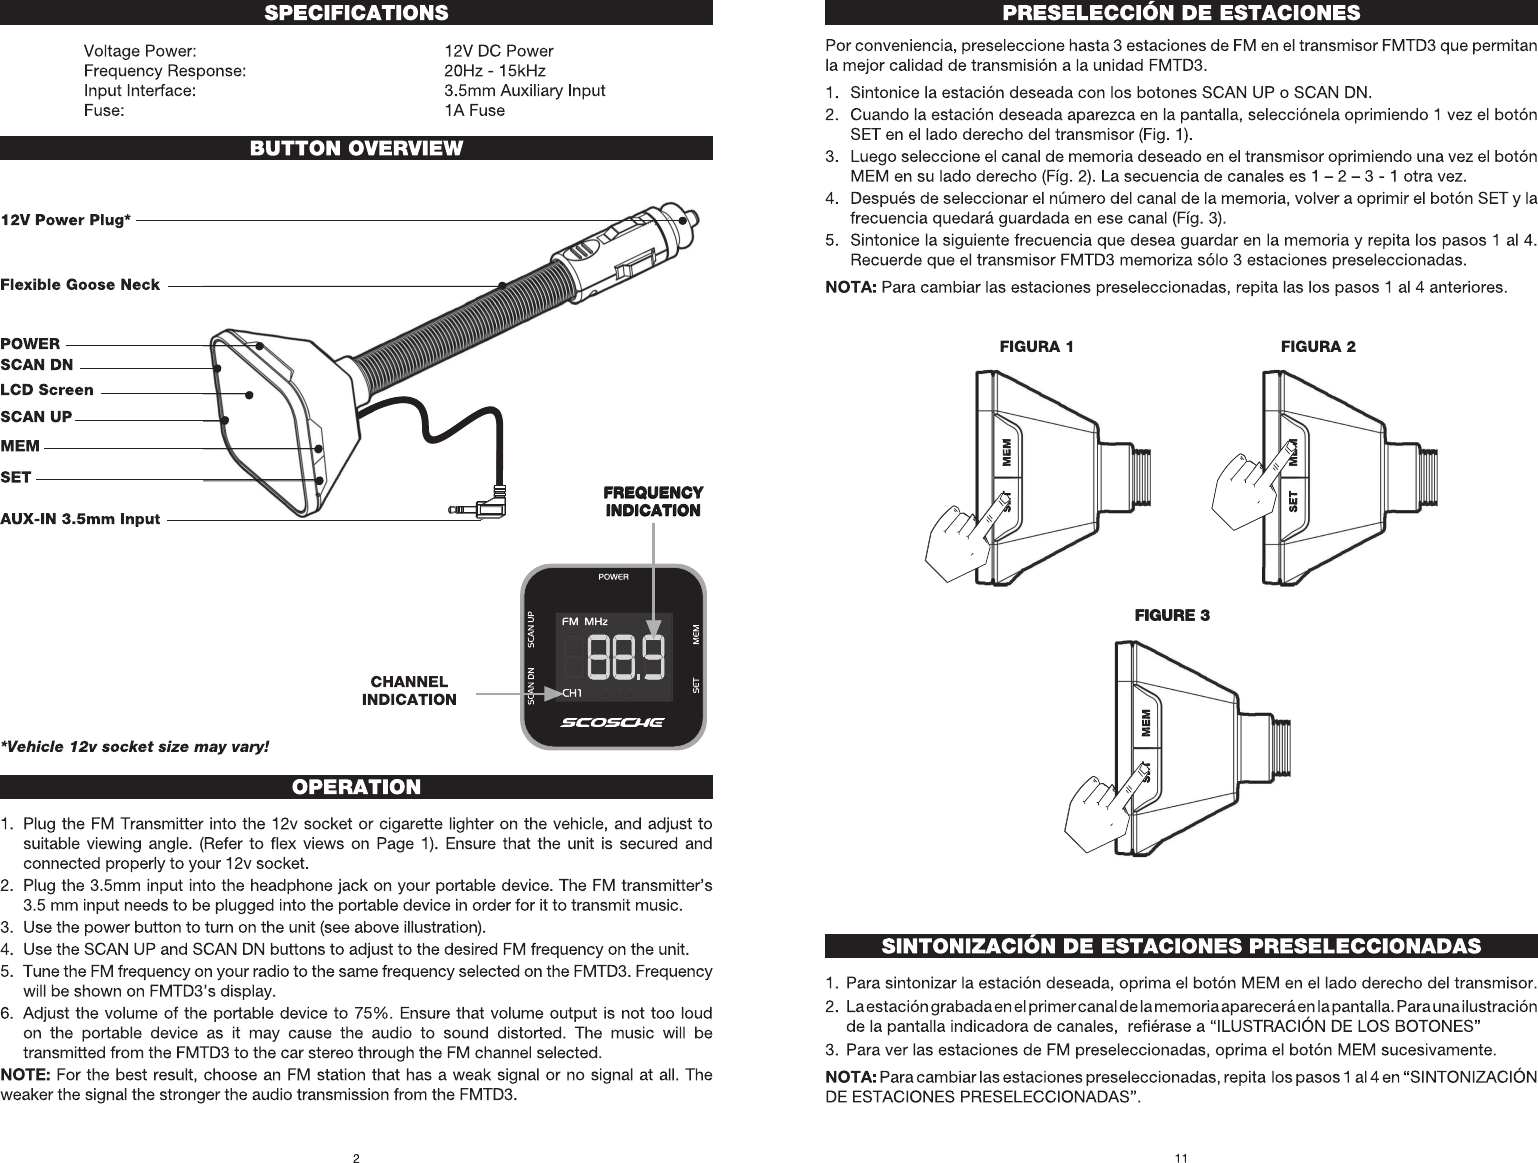 Scosche Fmtd3 Fm Transmitter User Manual Figure 2 Stereo Schematic